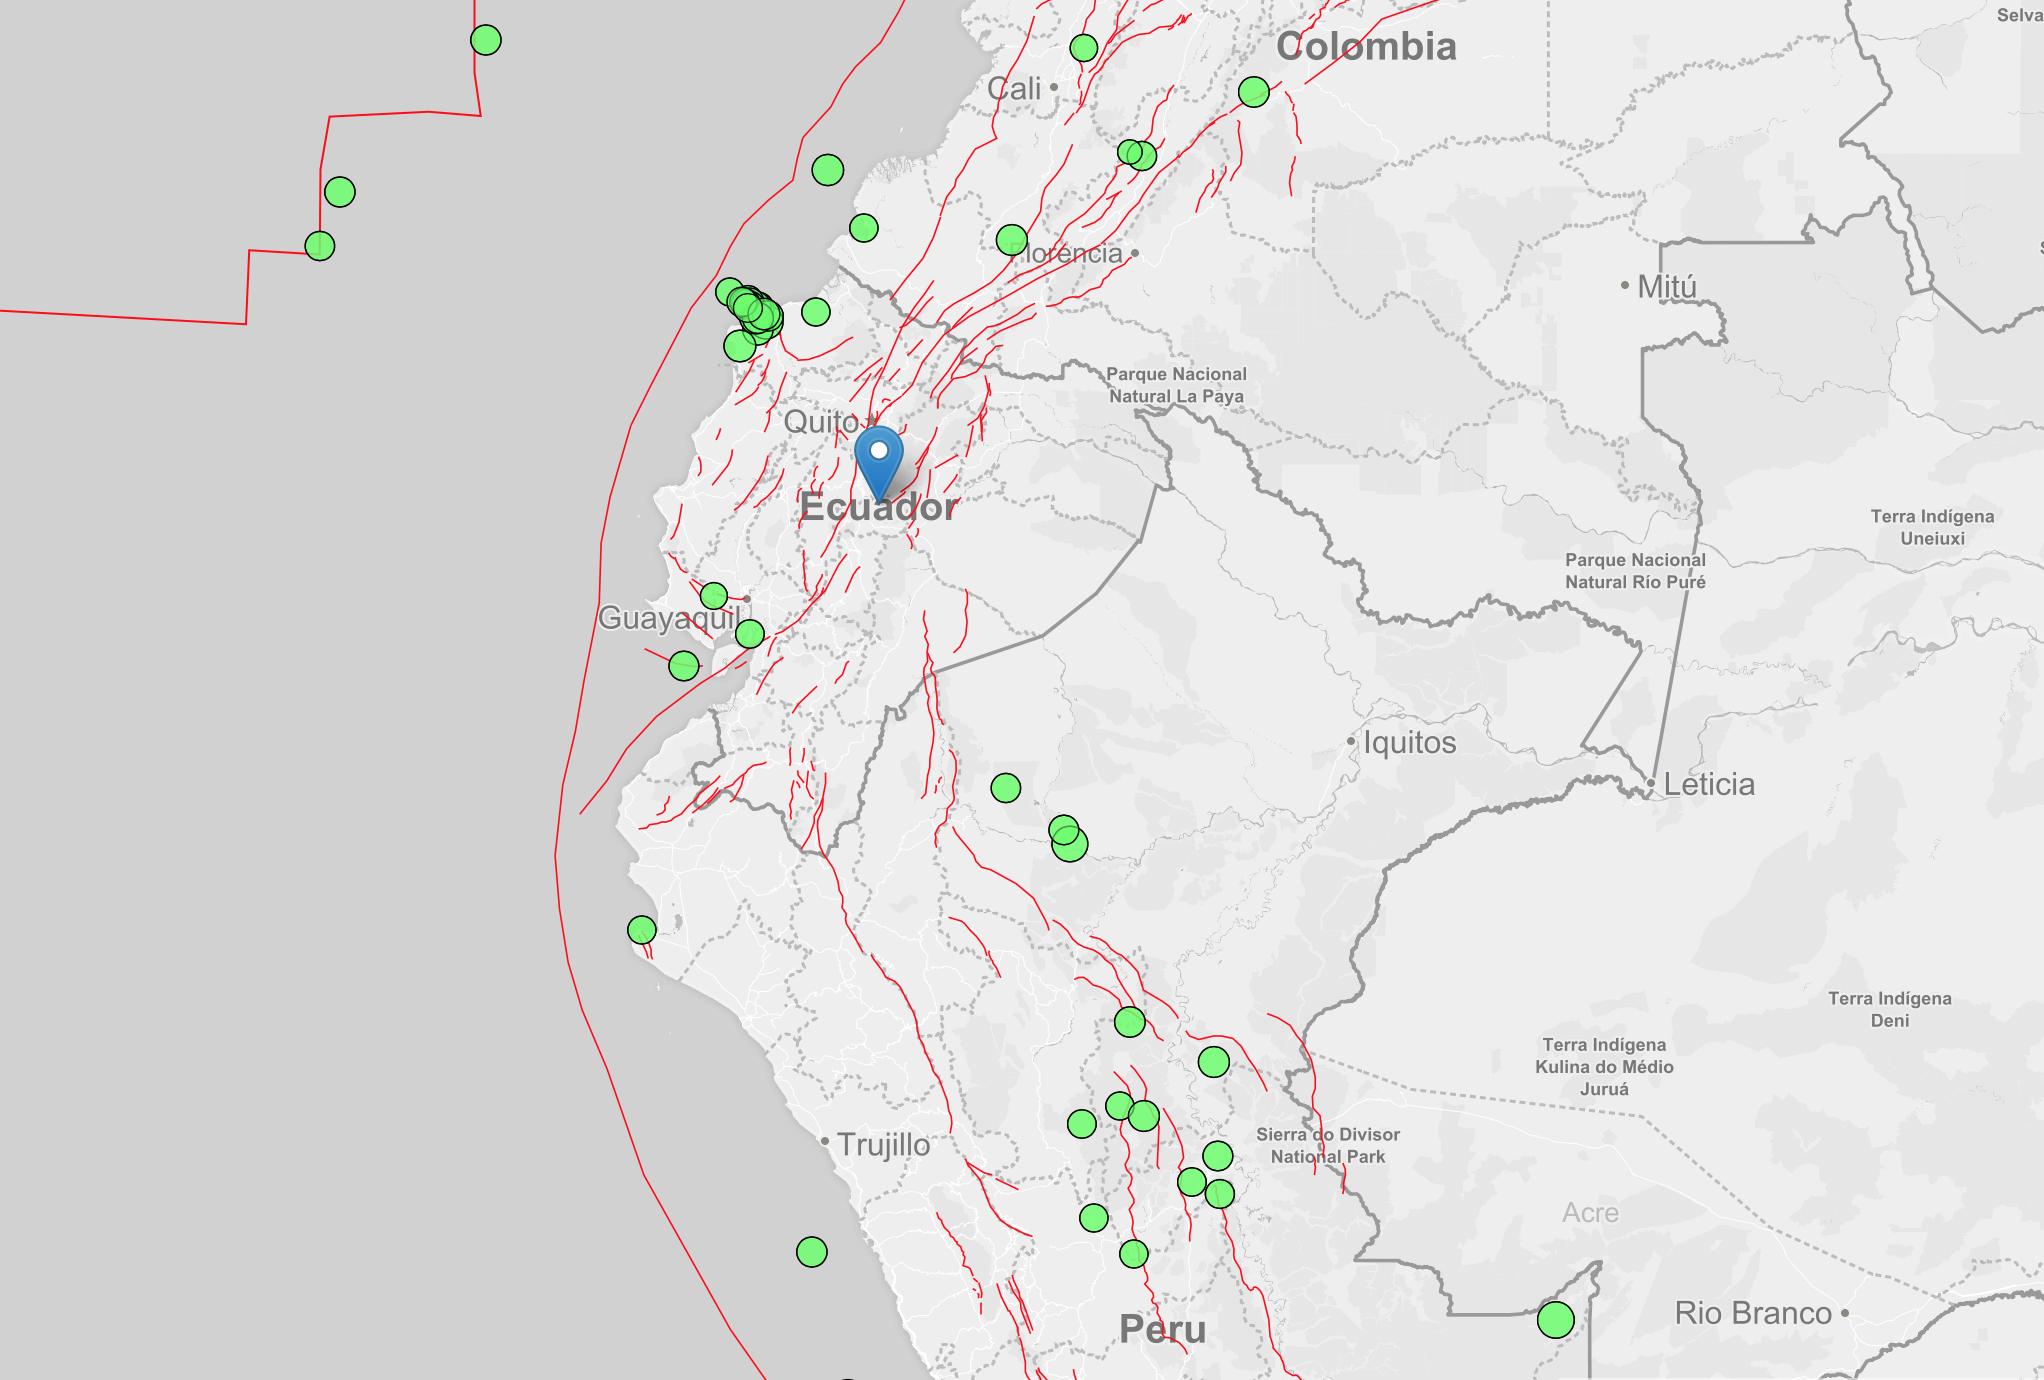 south-america-fault-map-peru-ecuador-colombia